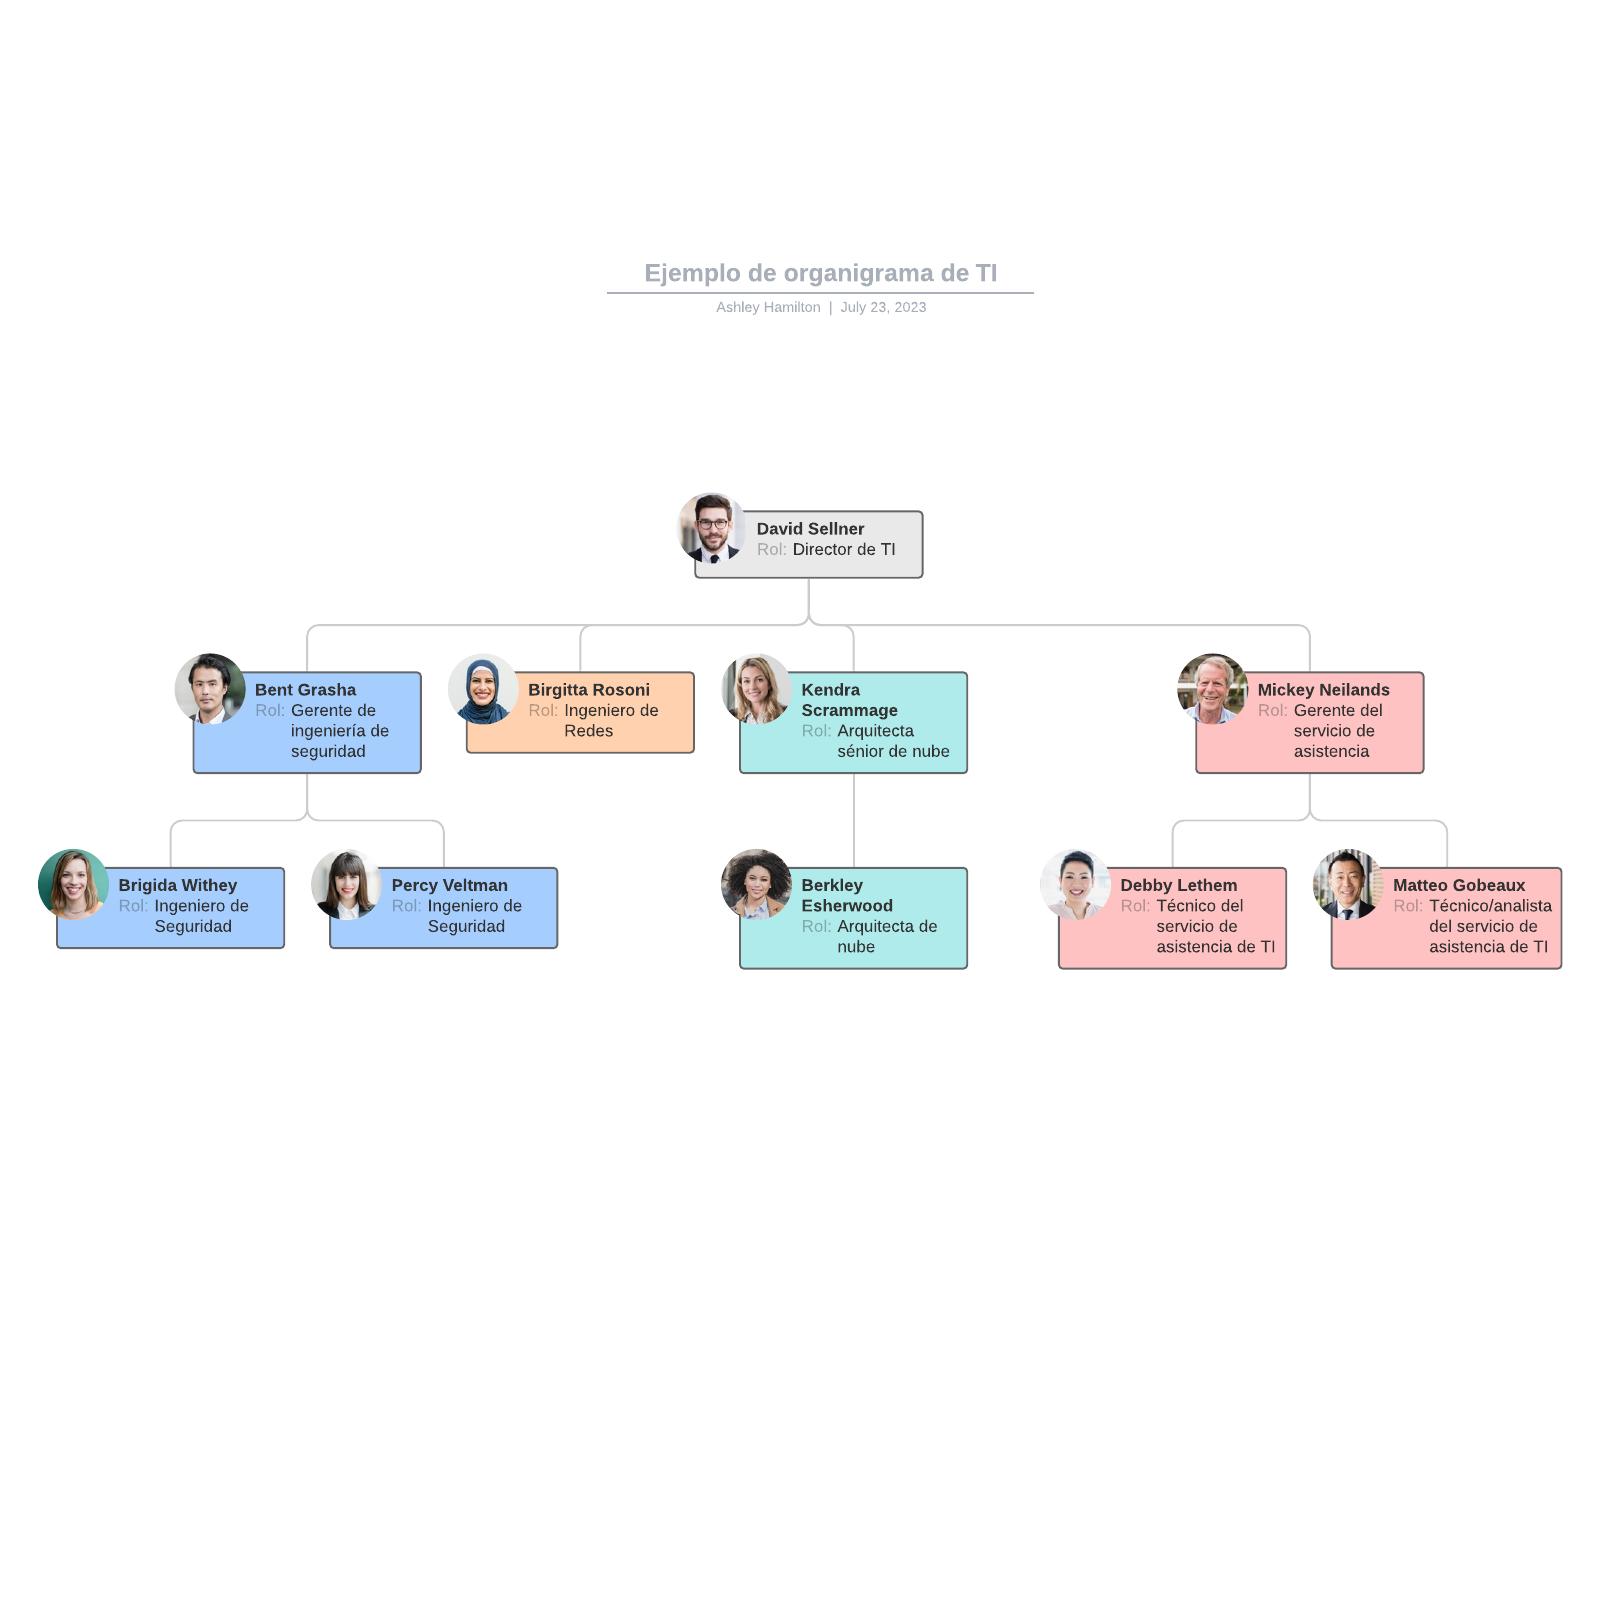 Ejemplo de organigrama de TI